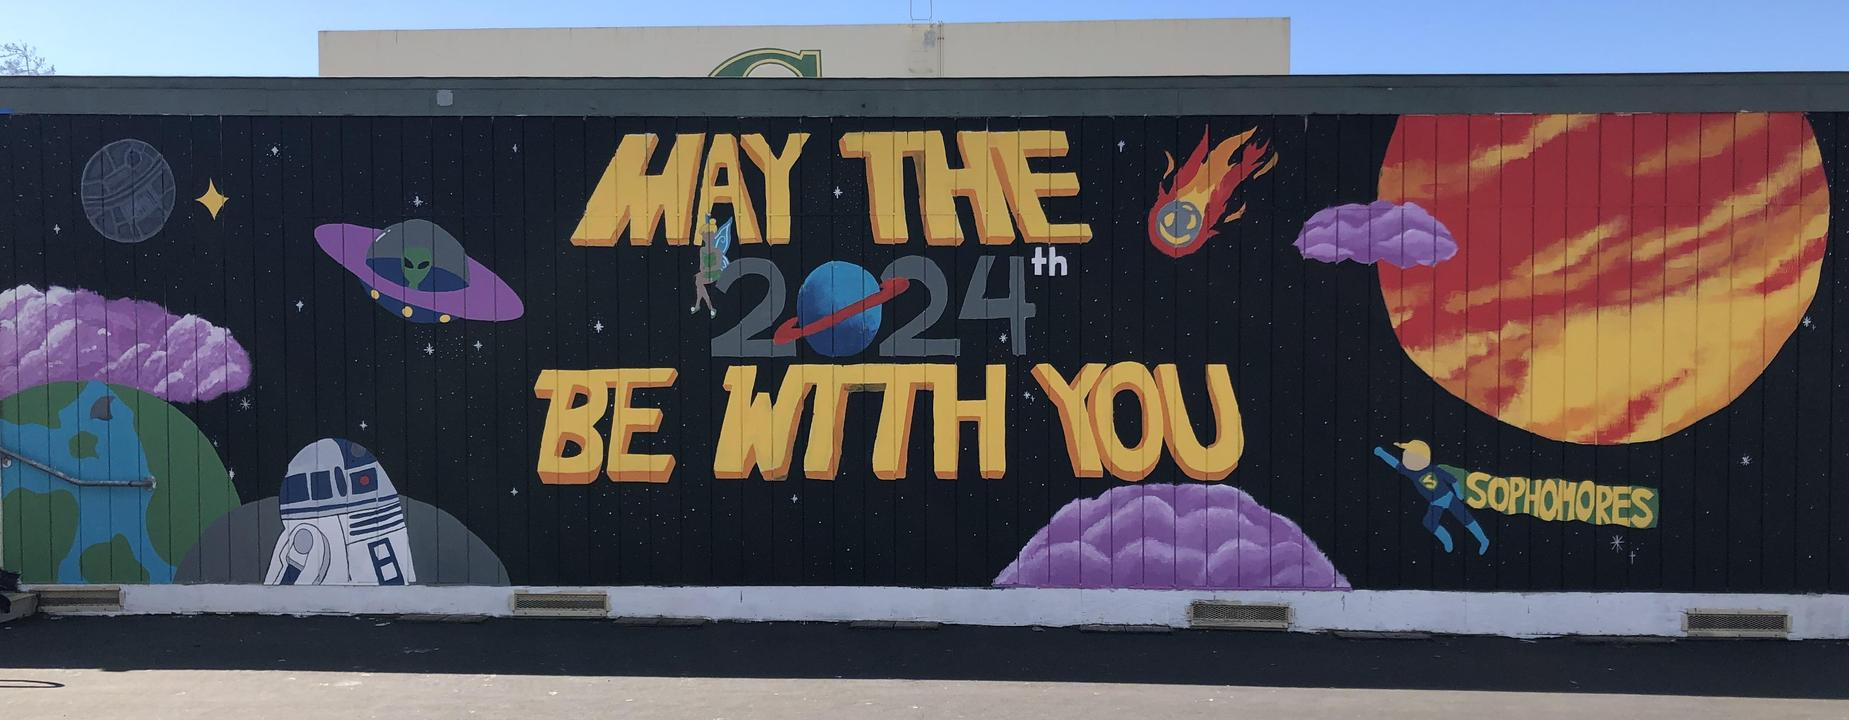 Sophomore mural